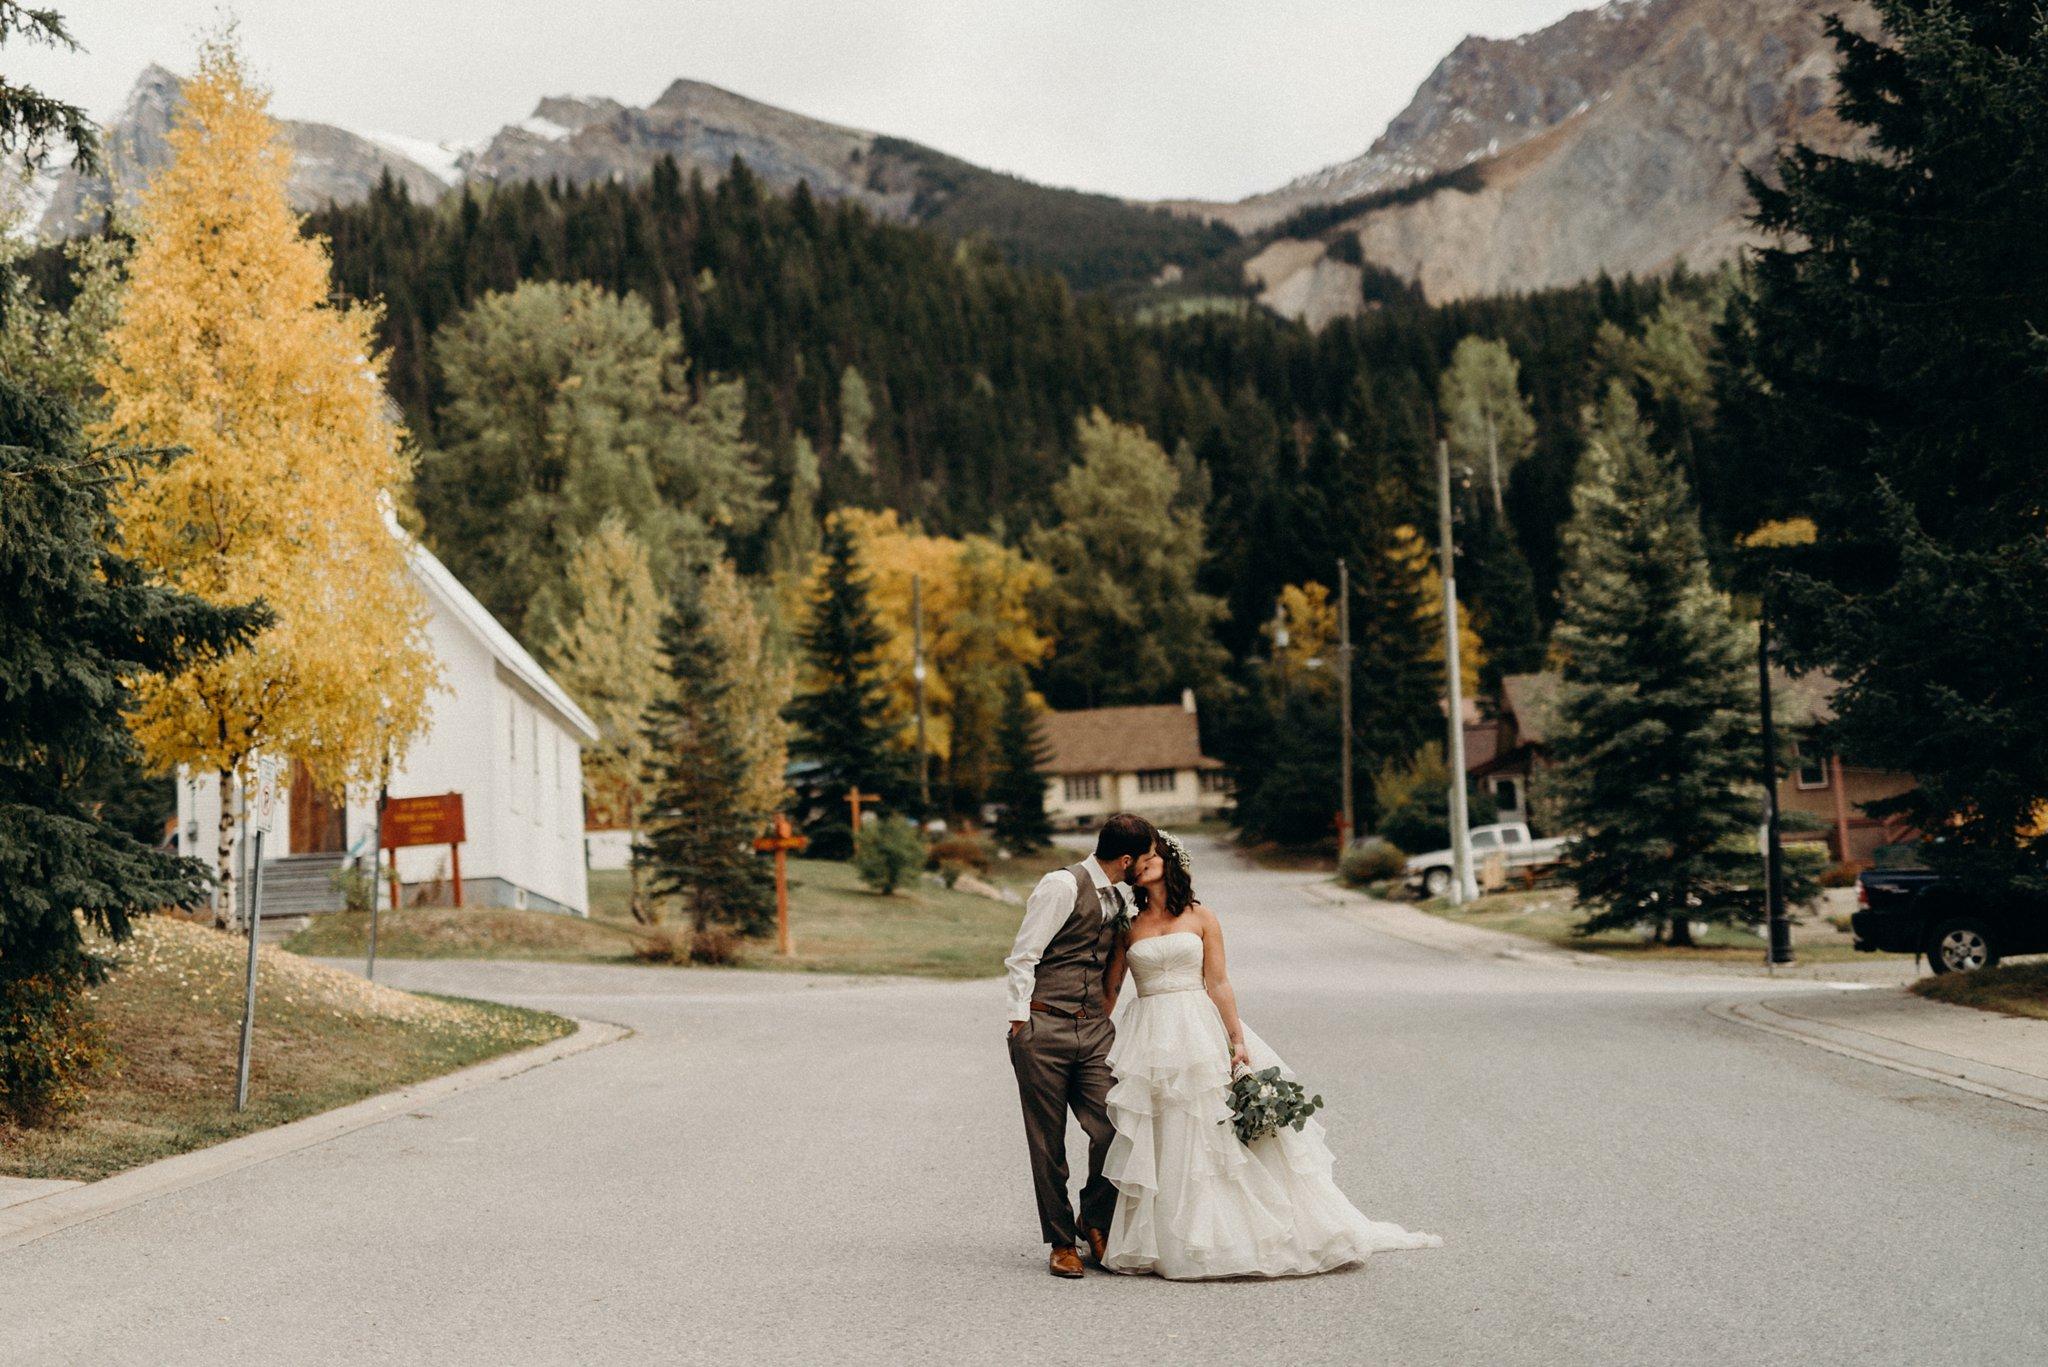 kaihla_tonai_intimate_wedding_elopement_photographer_6912.jpg